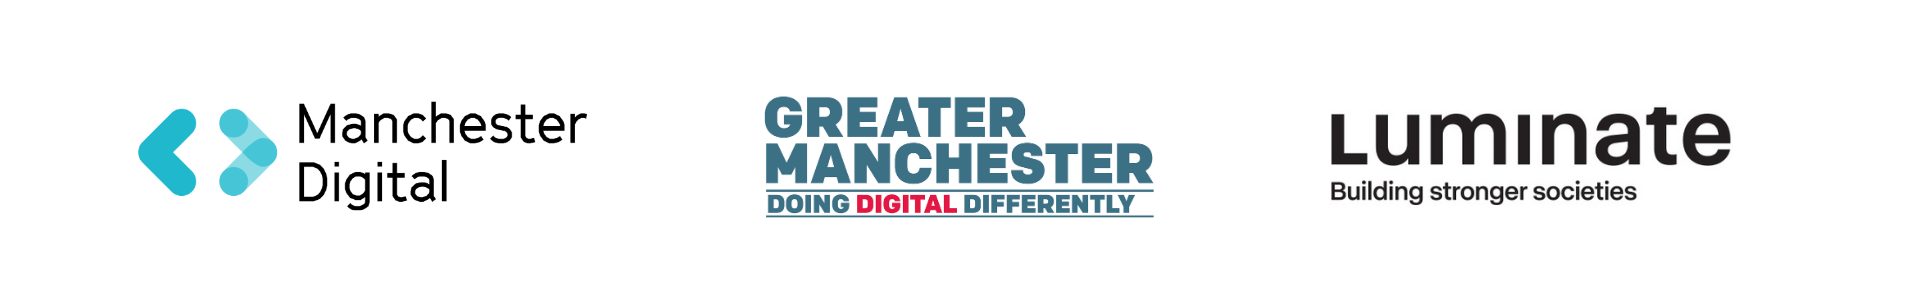 Manchester Digital, GMCA and Luminate logos